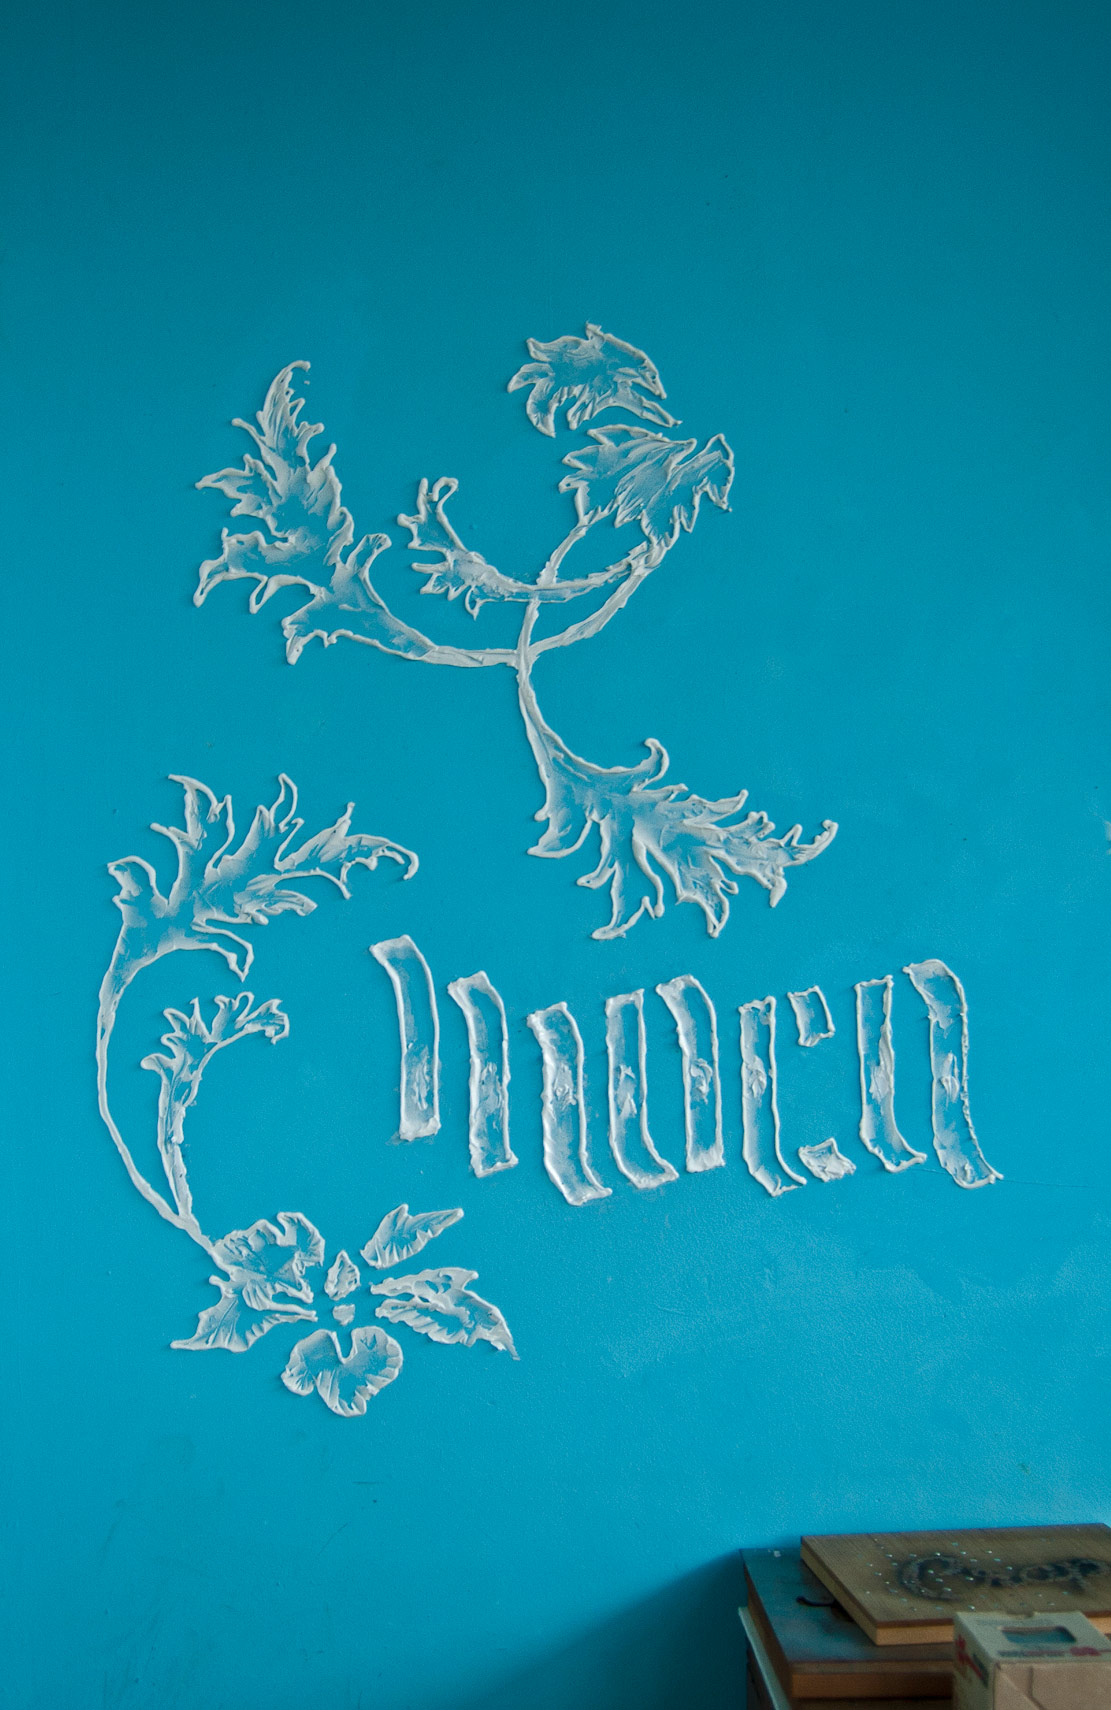 3D wallpaper, artwork, acrylic, lettering